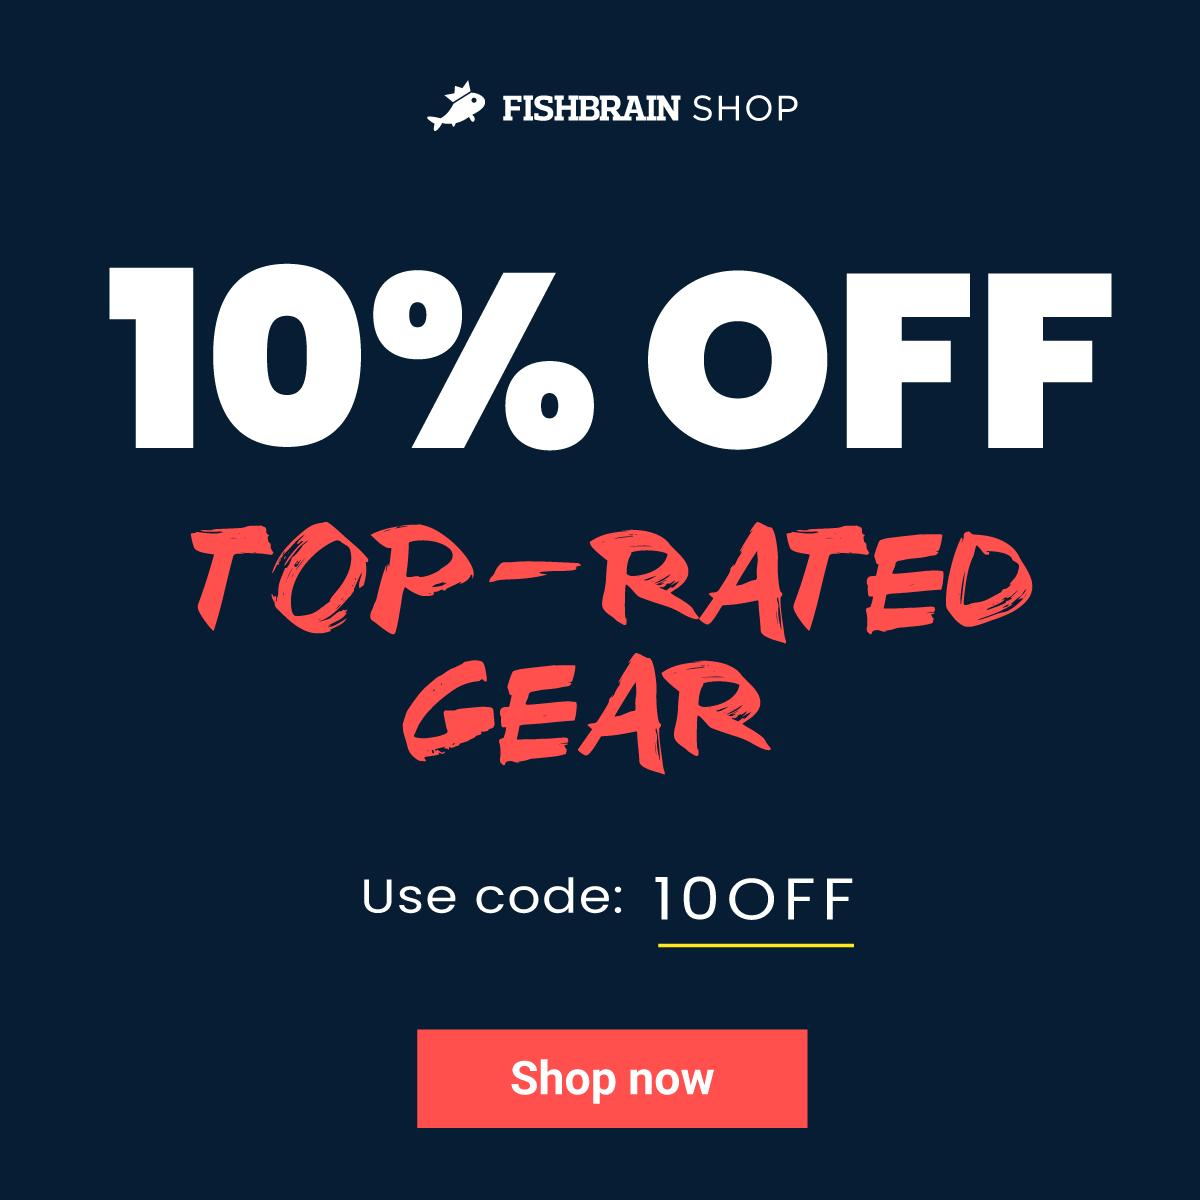 Fishbrain ad